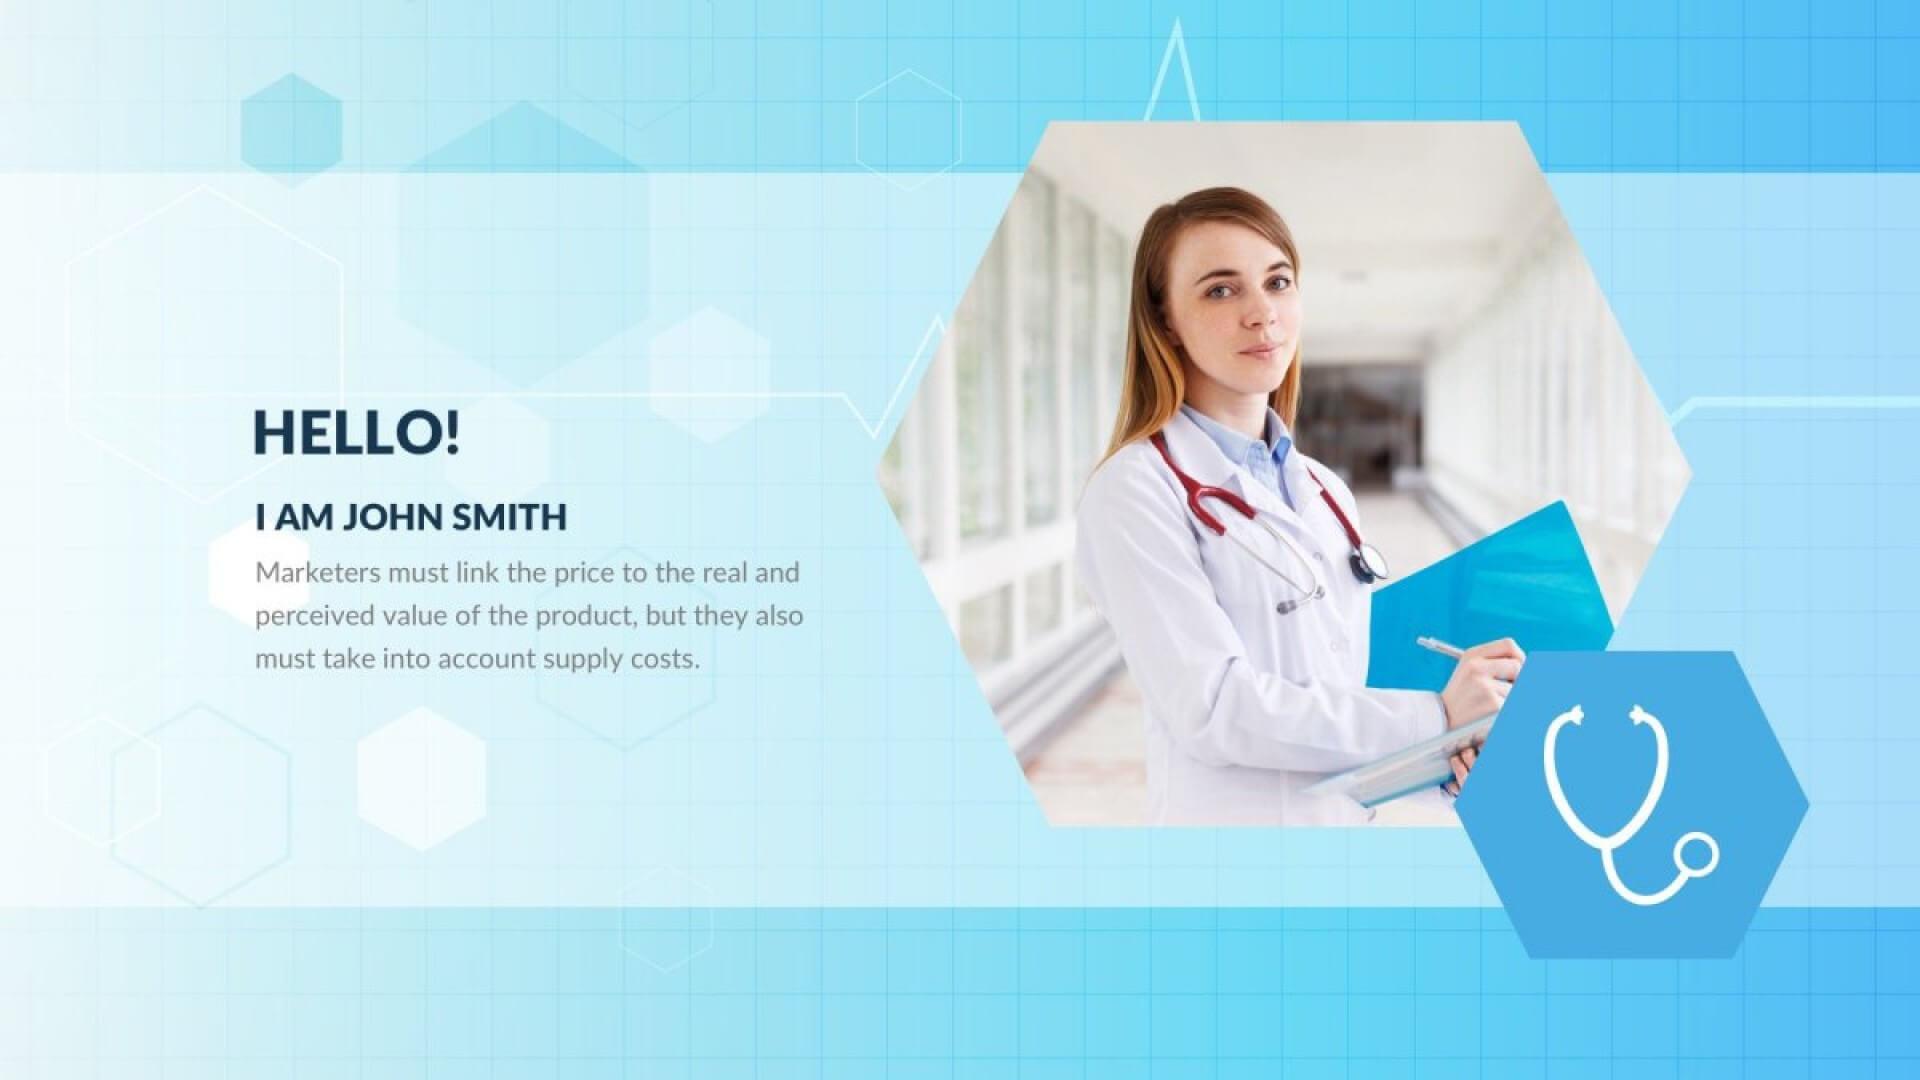 004 Template Ideas Free Nursing Powerpoint Templates Alpha With Regard To Free Nursing Powerpoint Templates